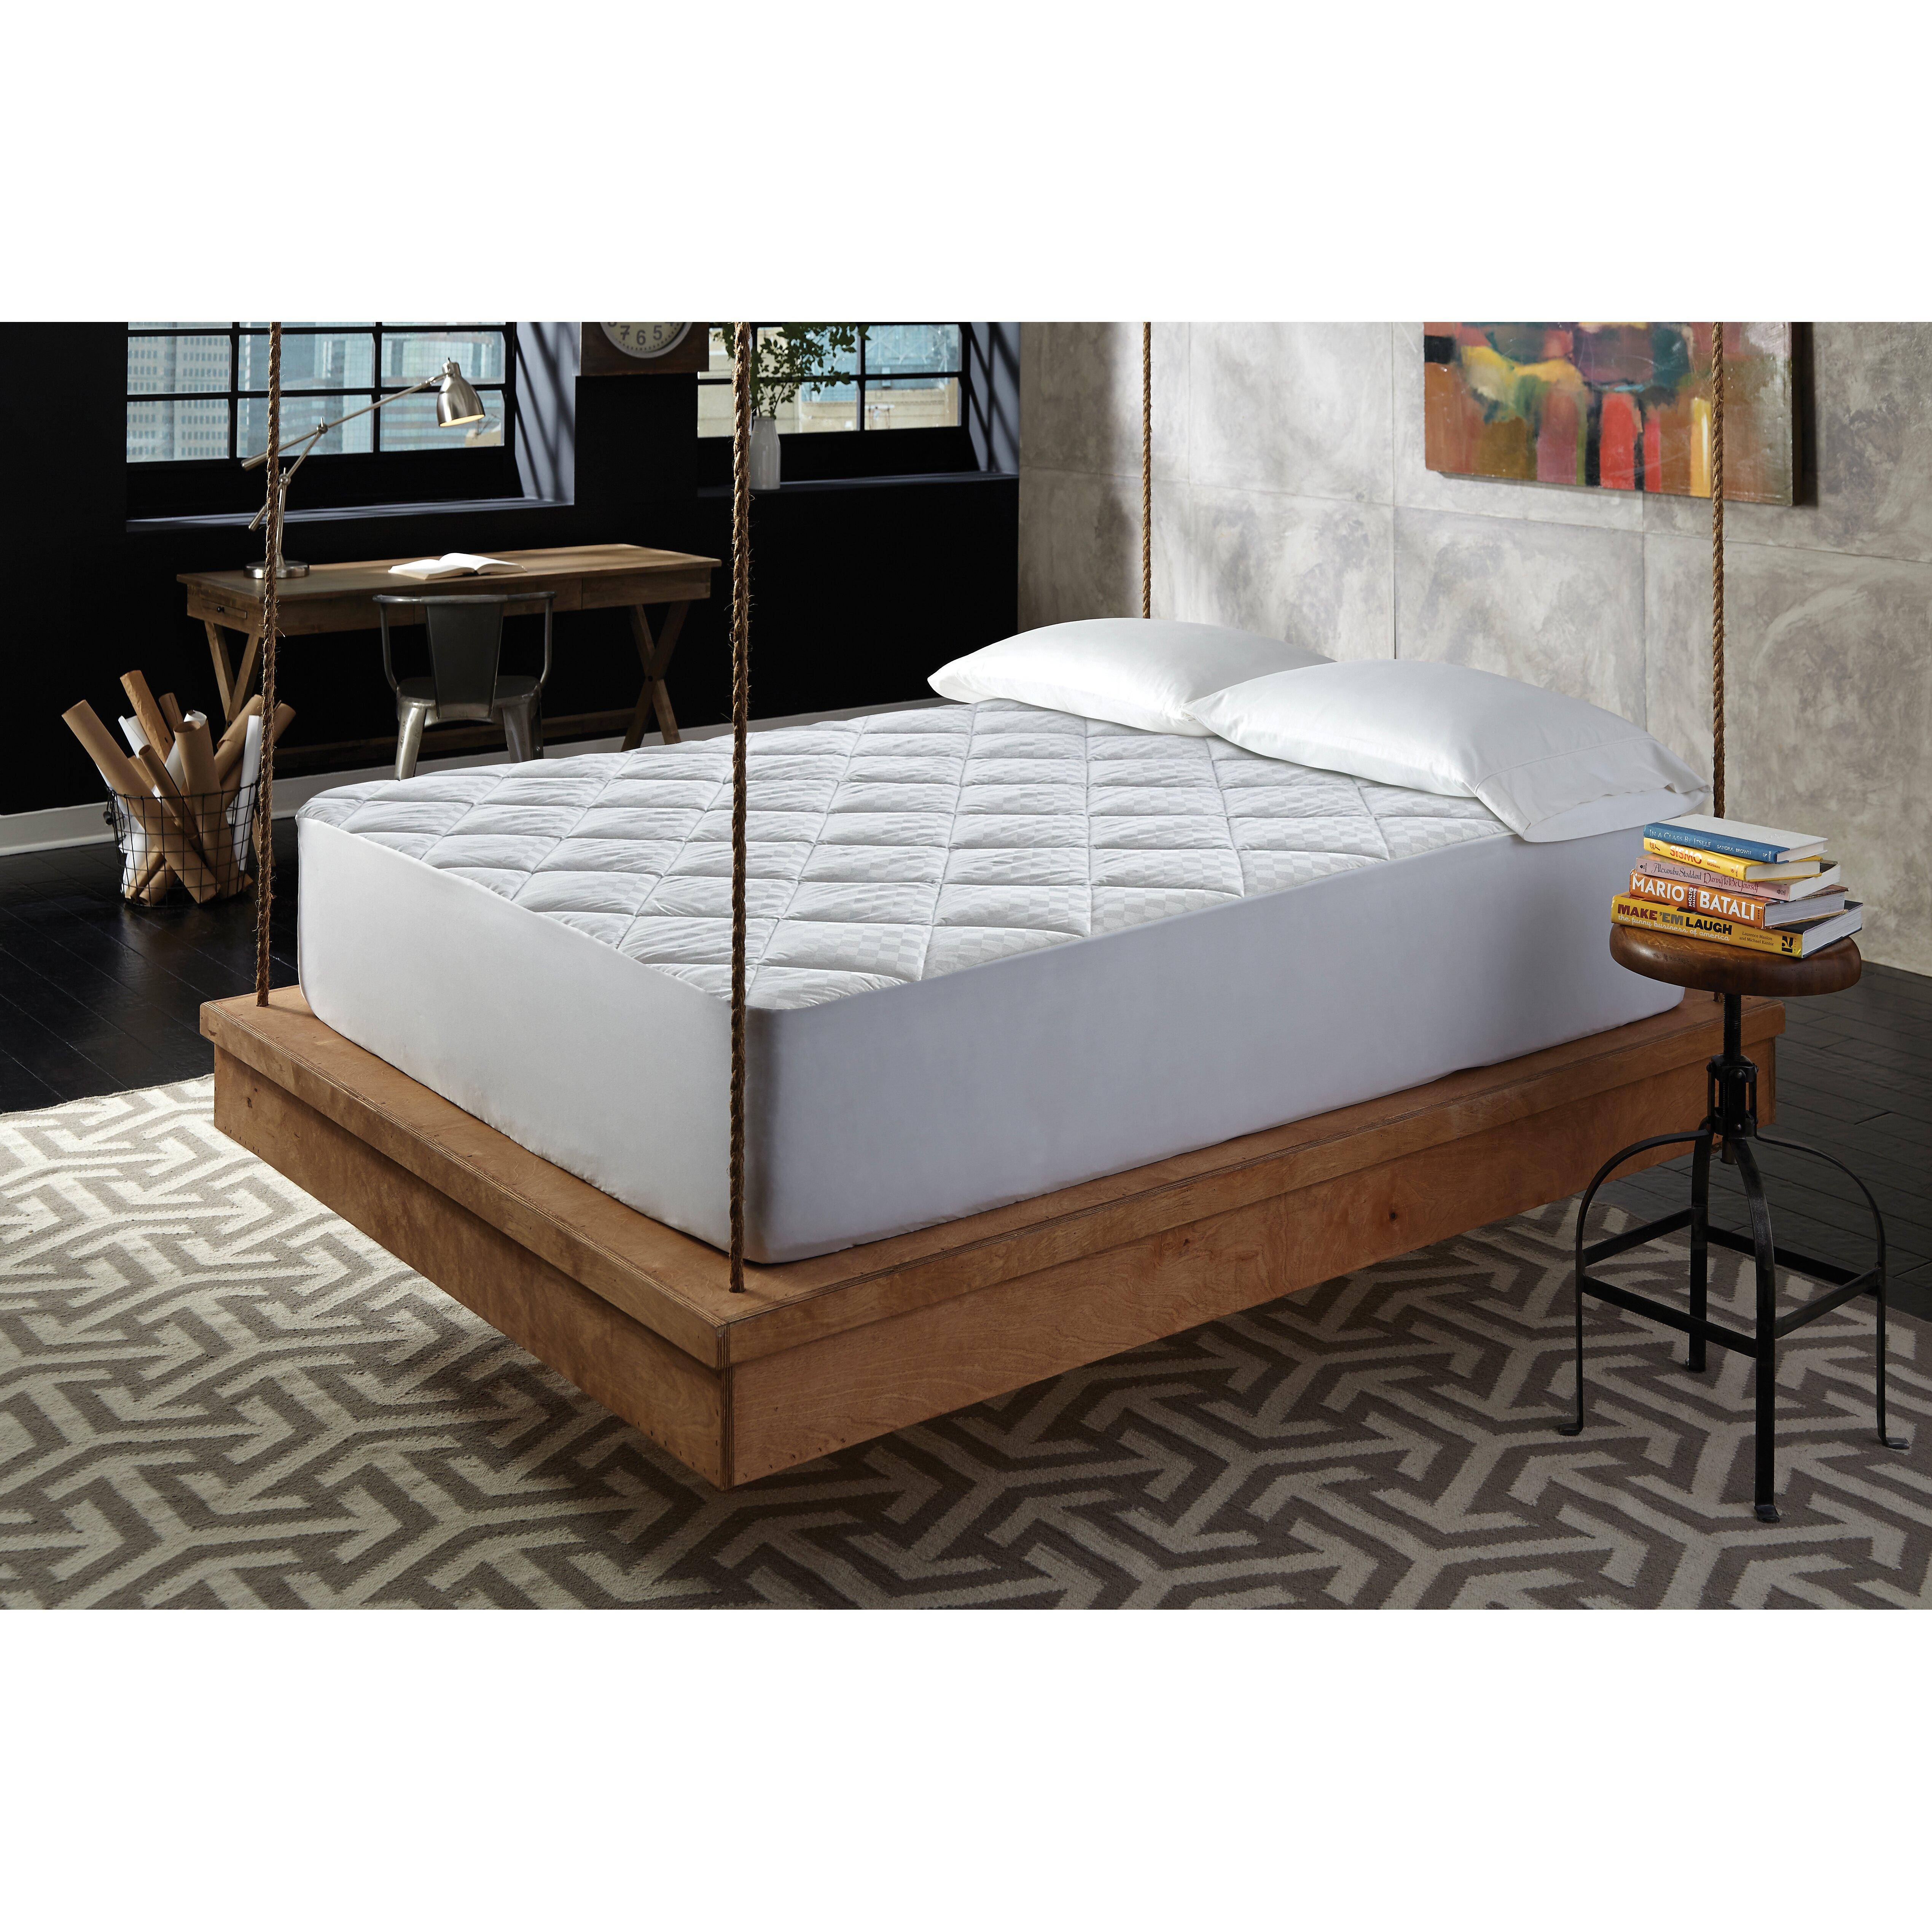 Frisco Microfiber Sofa Bed Queen Mattress Pad Sofa Review : MGM GRAND at home Platinum Jacquard Diamond Quilt Mattress Pad from www.sofareviewhd.co size 5077 x 5077 jpeg 2267kB